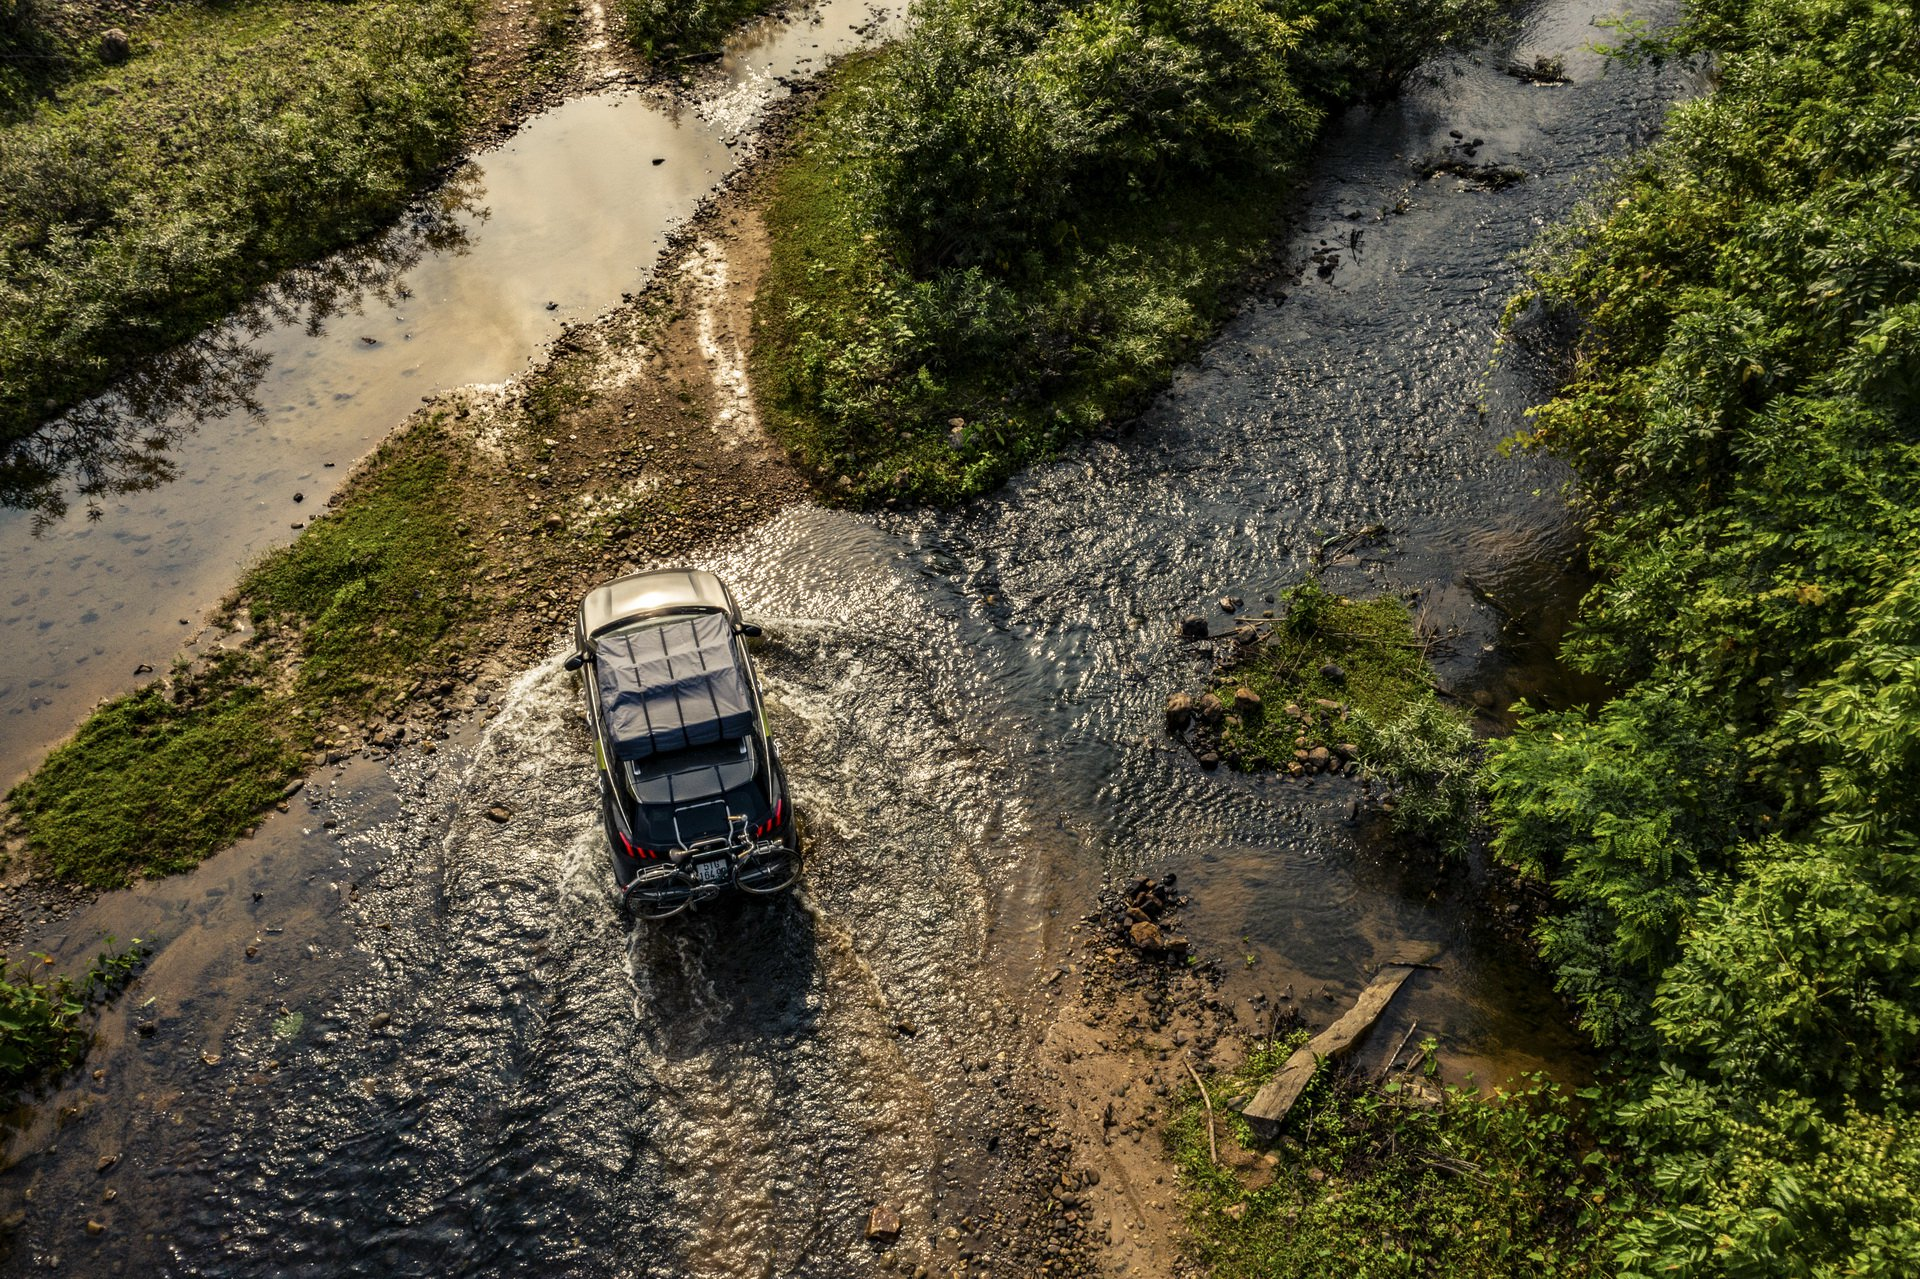 Peugeot-3008-Concept-Vietnam-Adventure-8